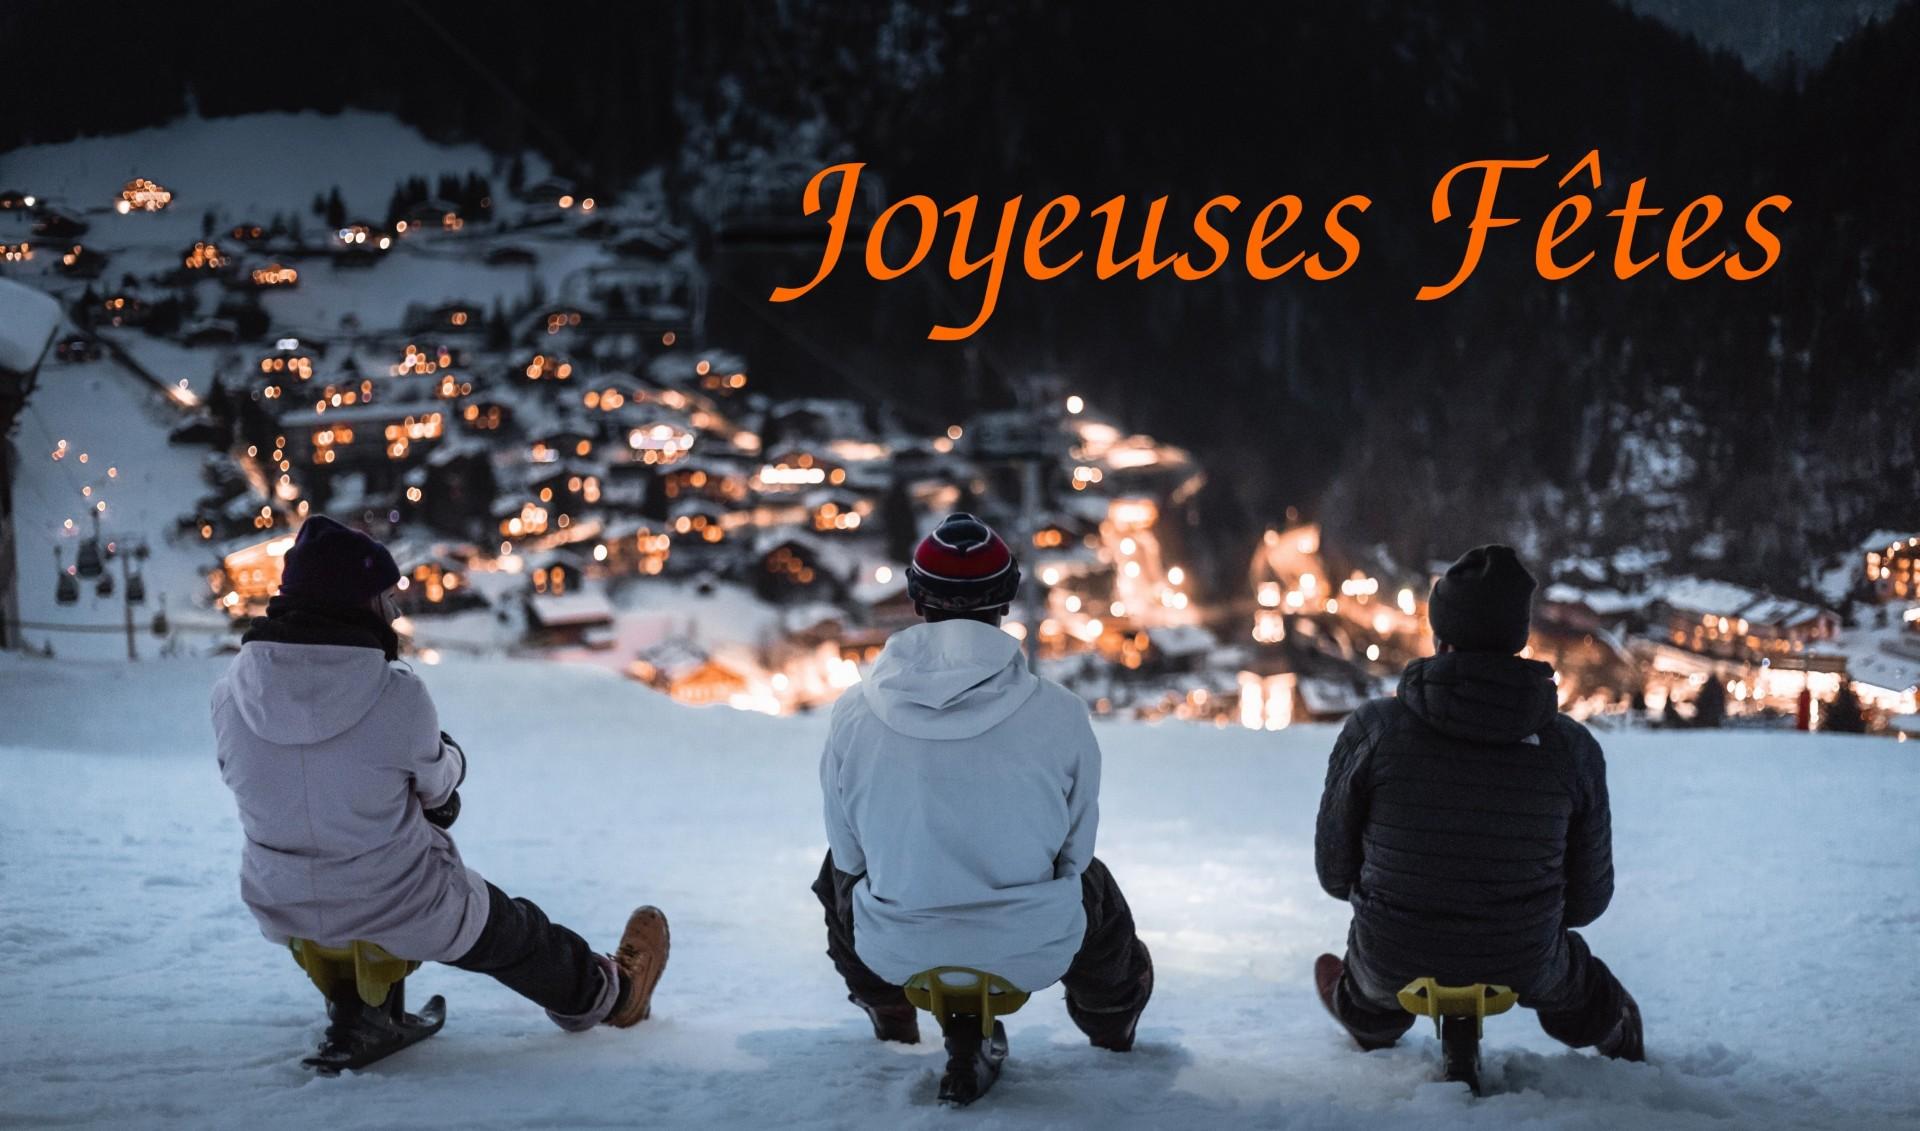 joyeusfetesyoonerter-324